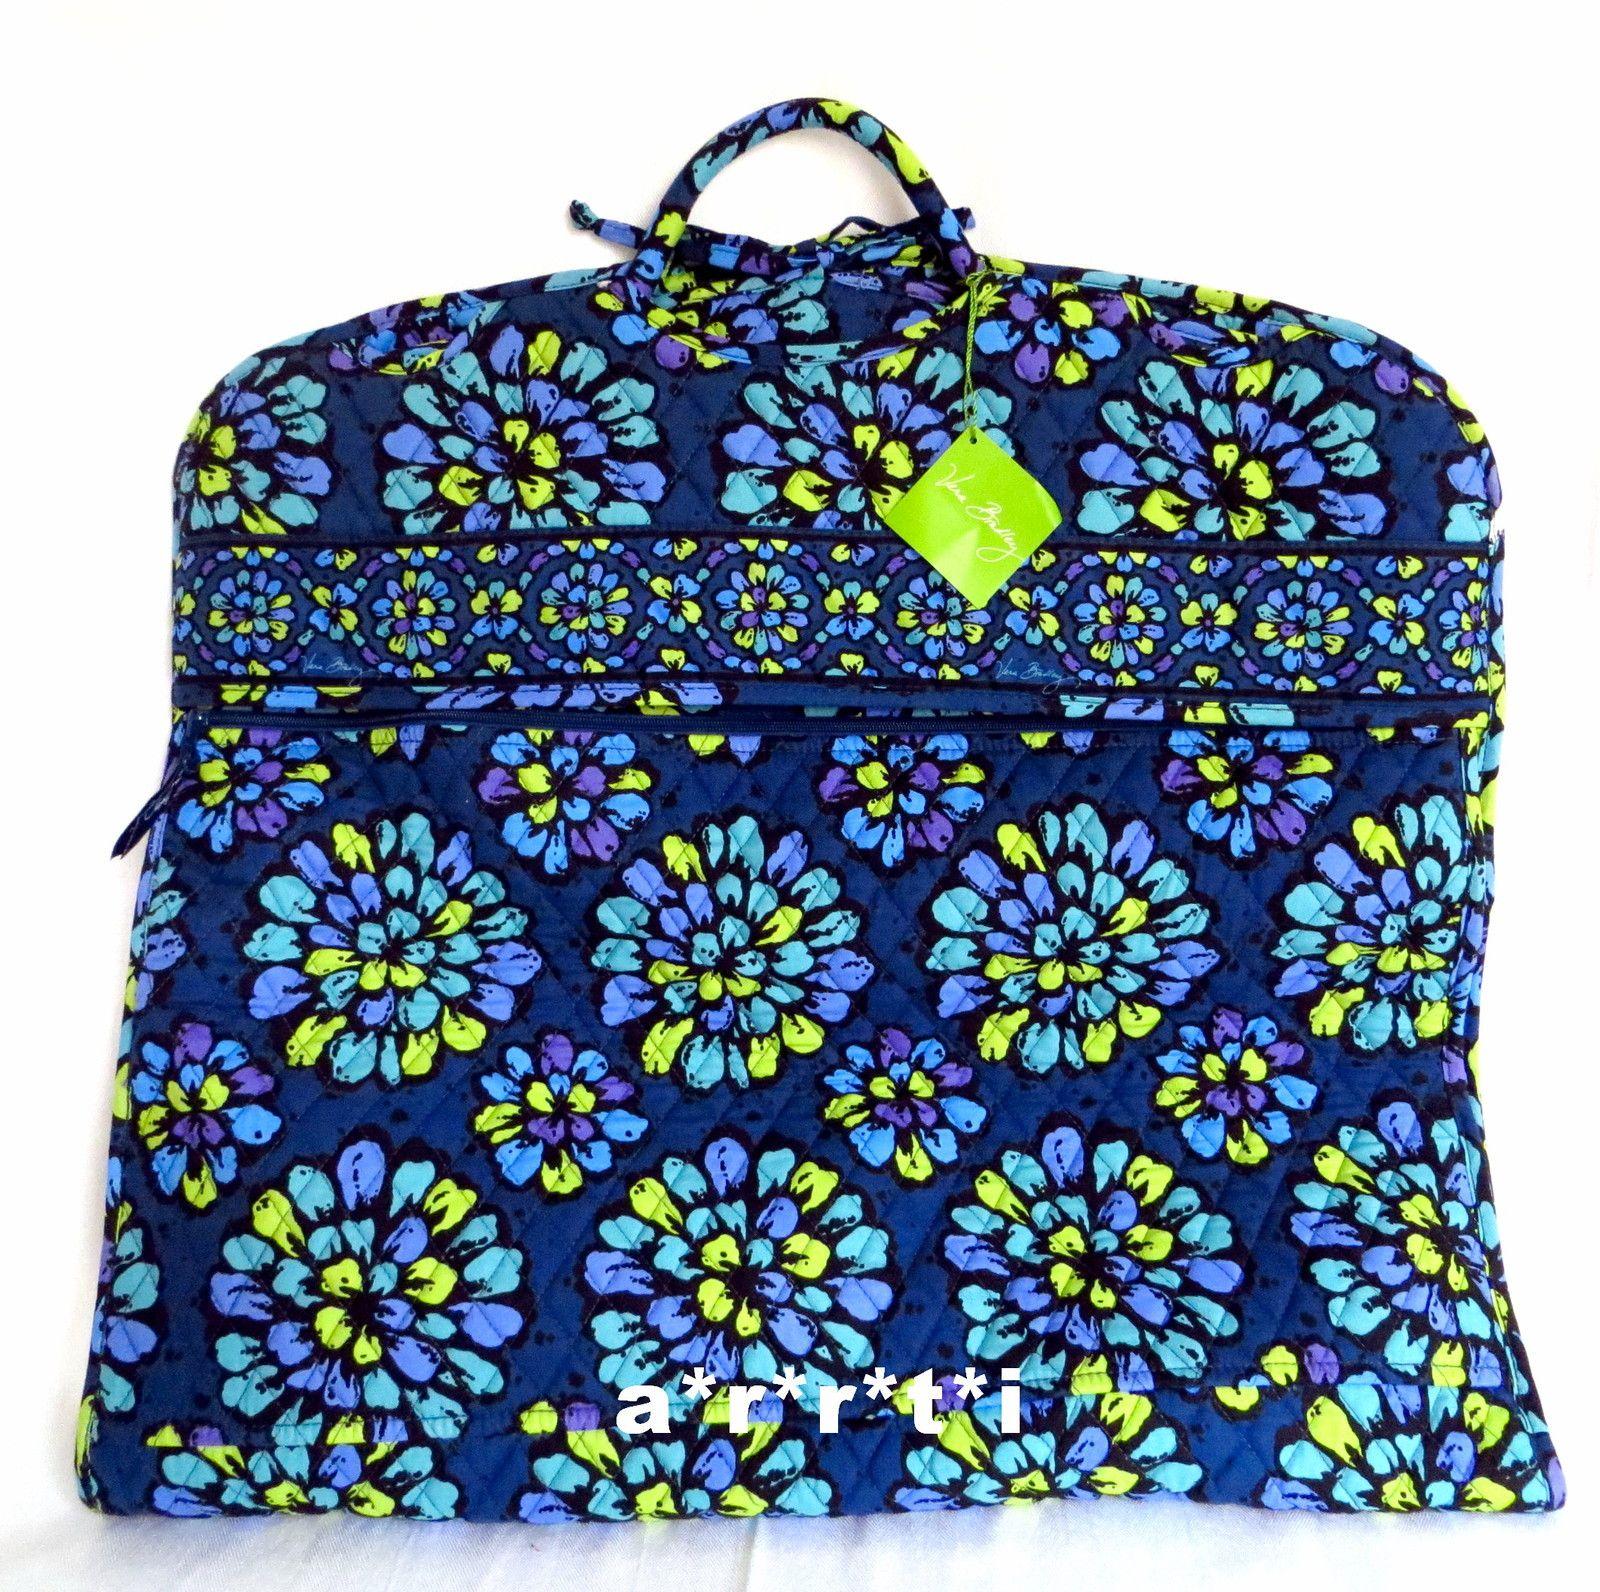 f080321ffe7d Vera Bradley Garment Bag Indigo Pop New with Tags ...